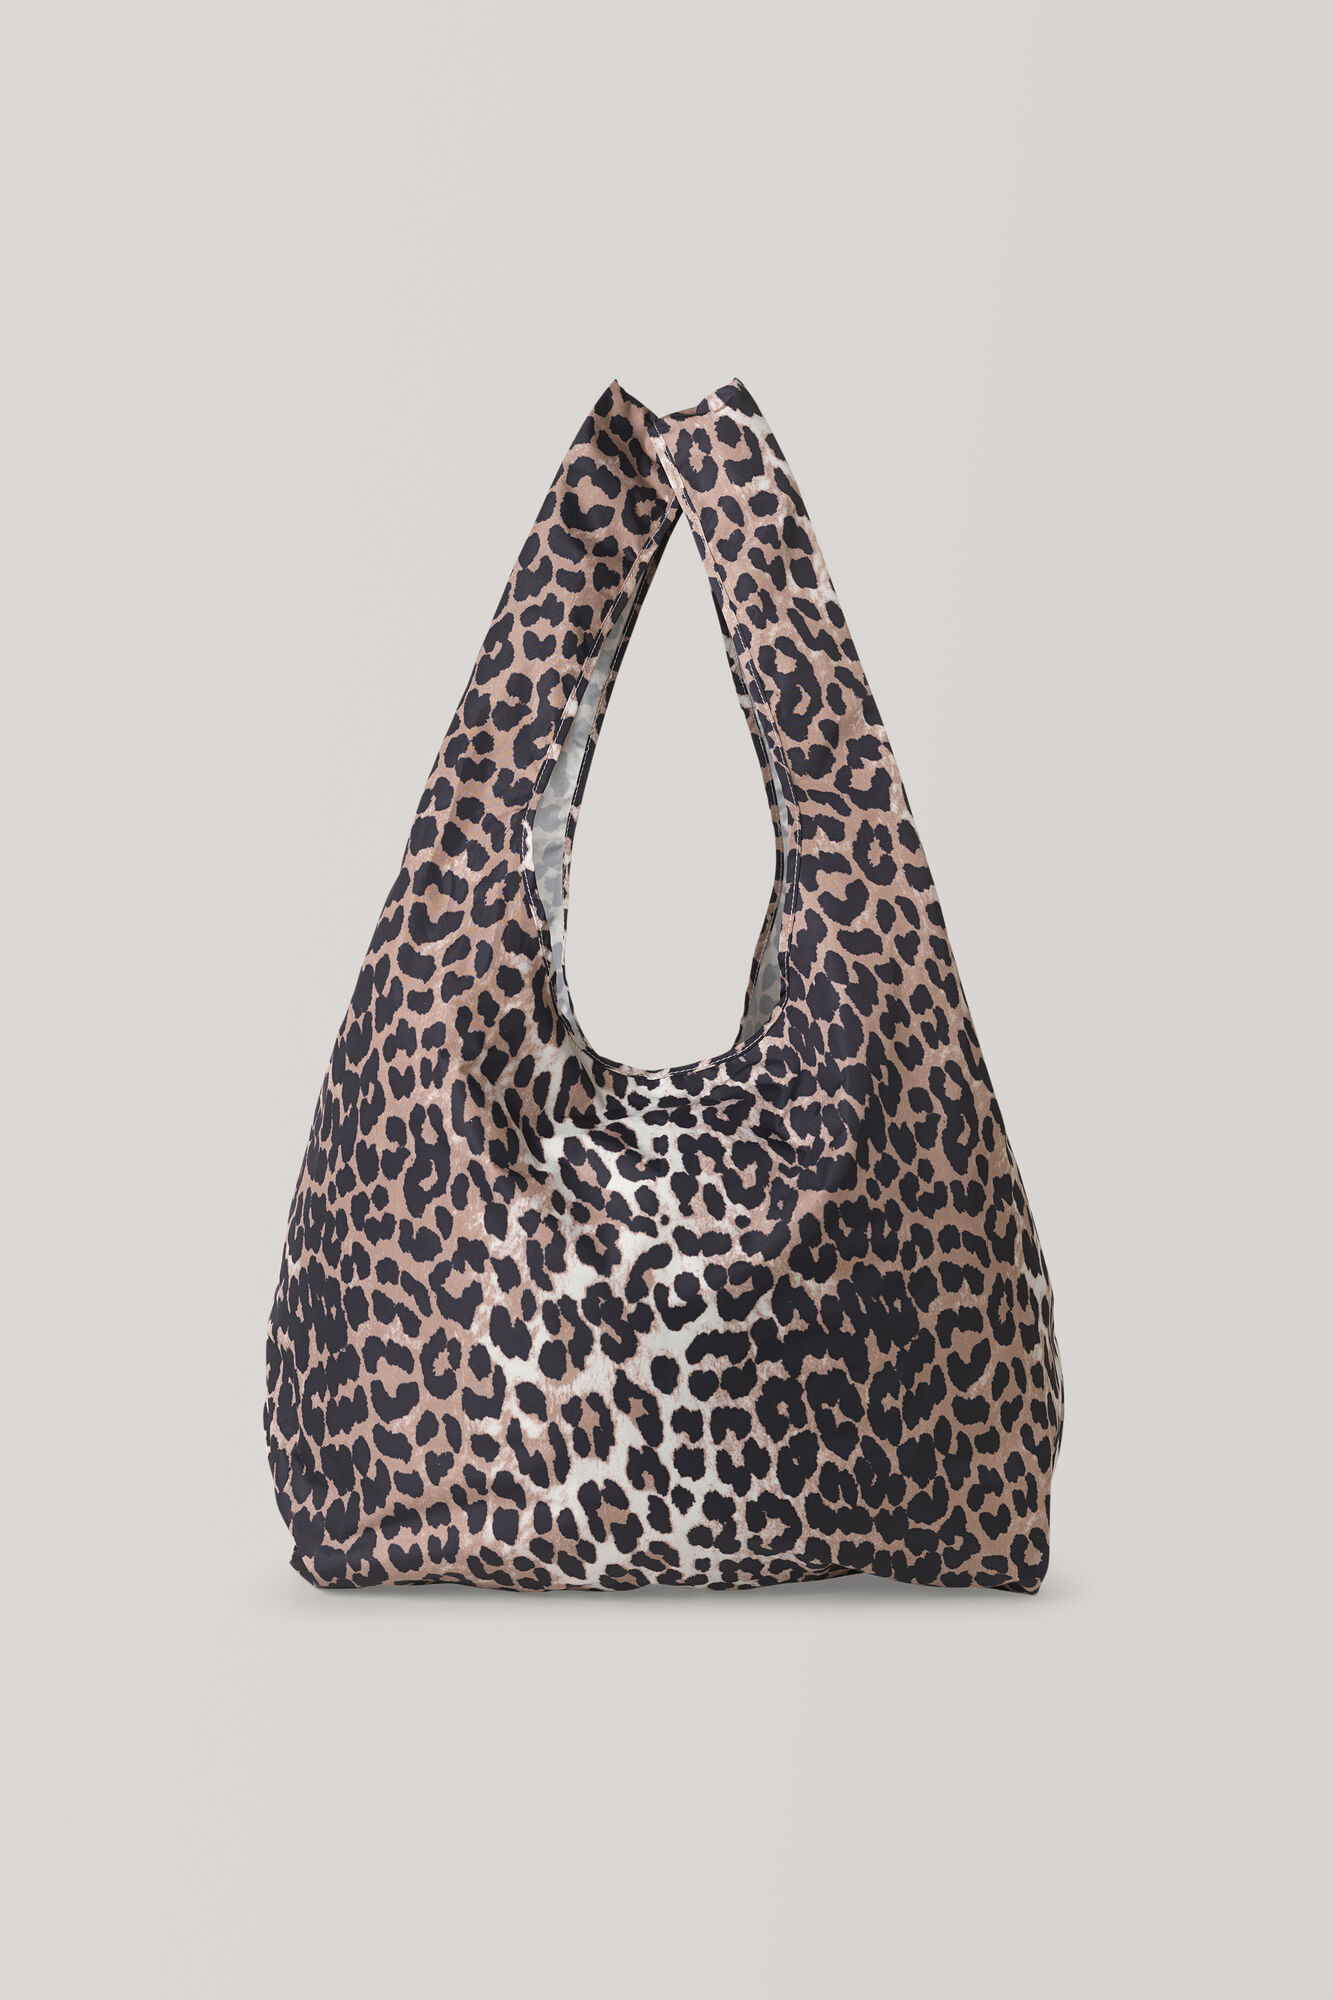 Fairmont Accessories Tote Bag, Leopard, hi-res